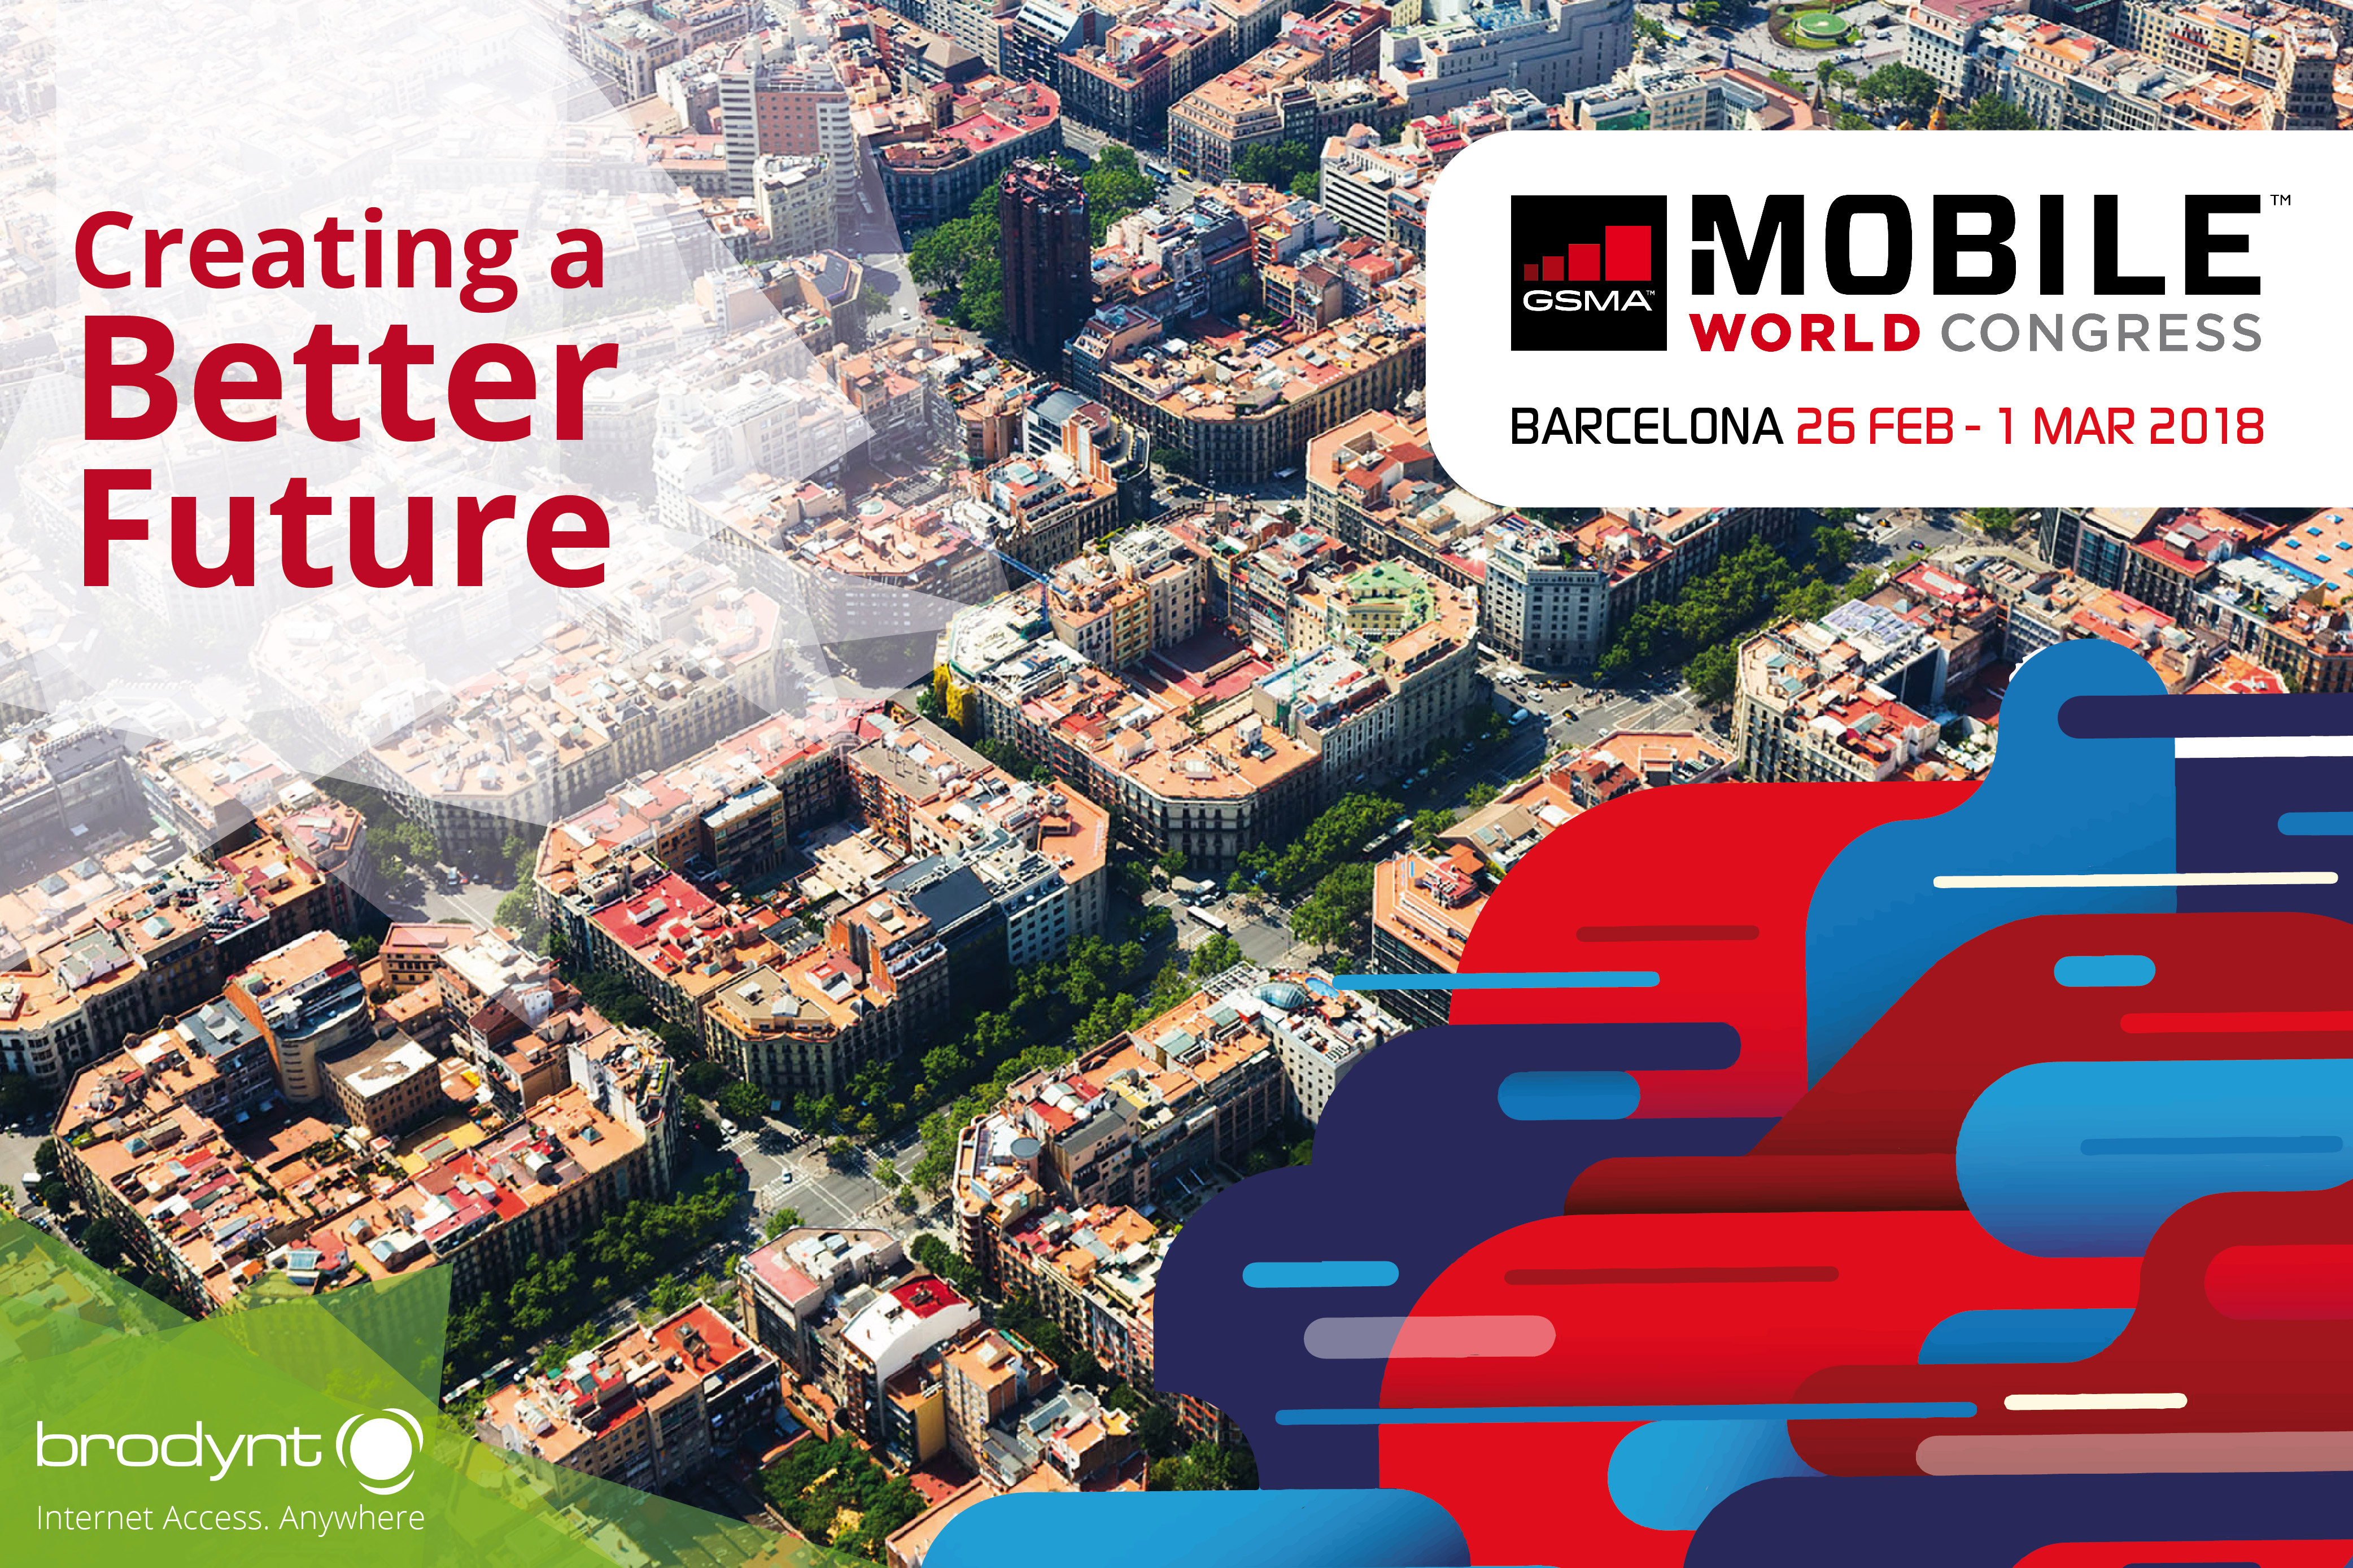 Technology event Barcelona